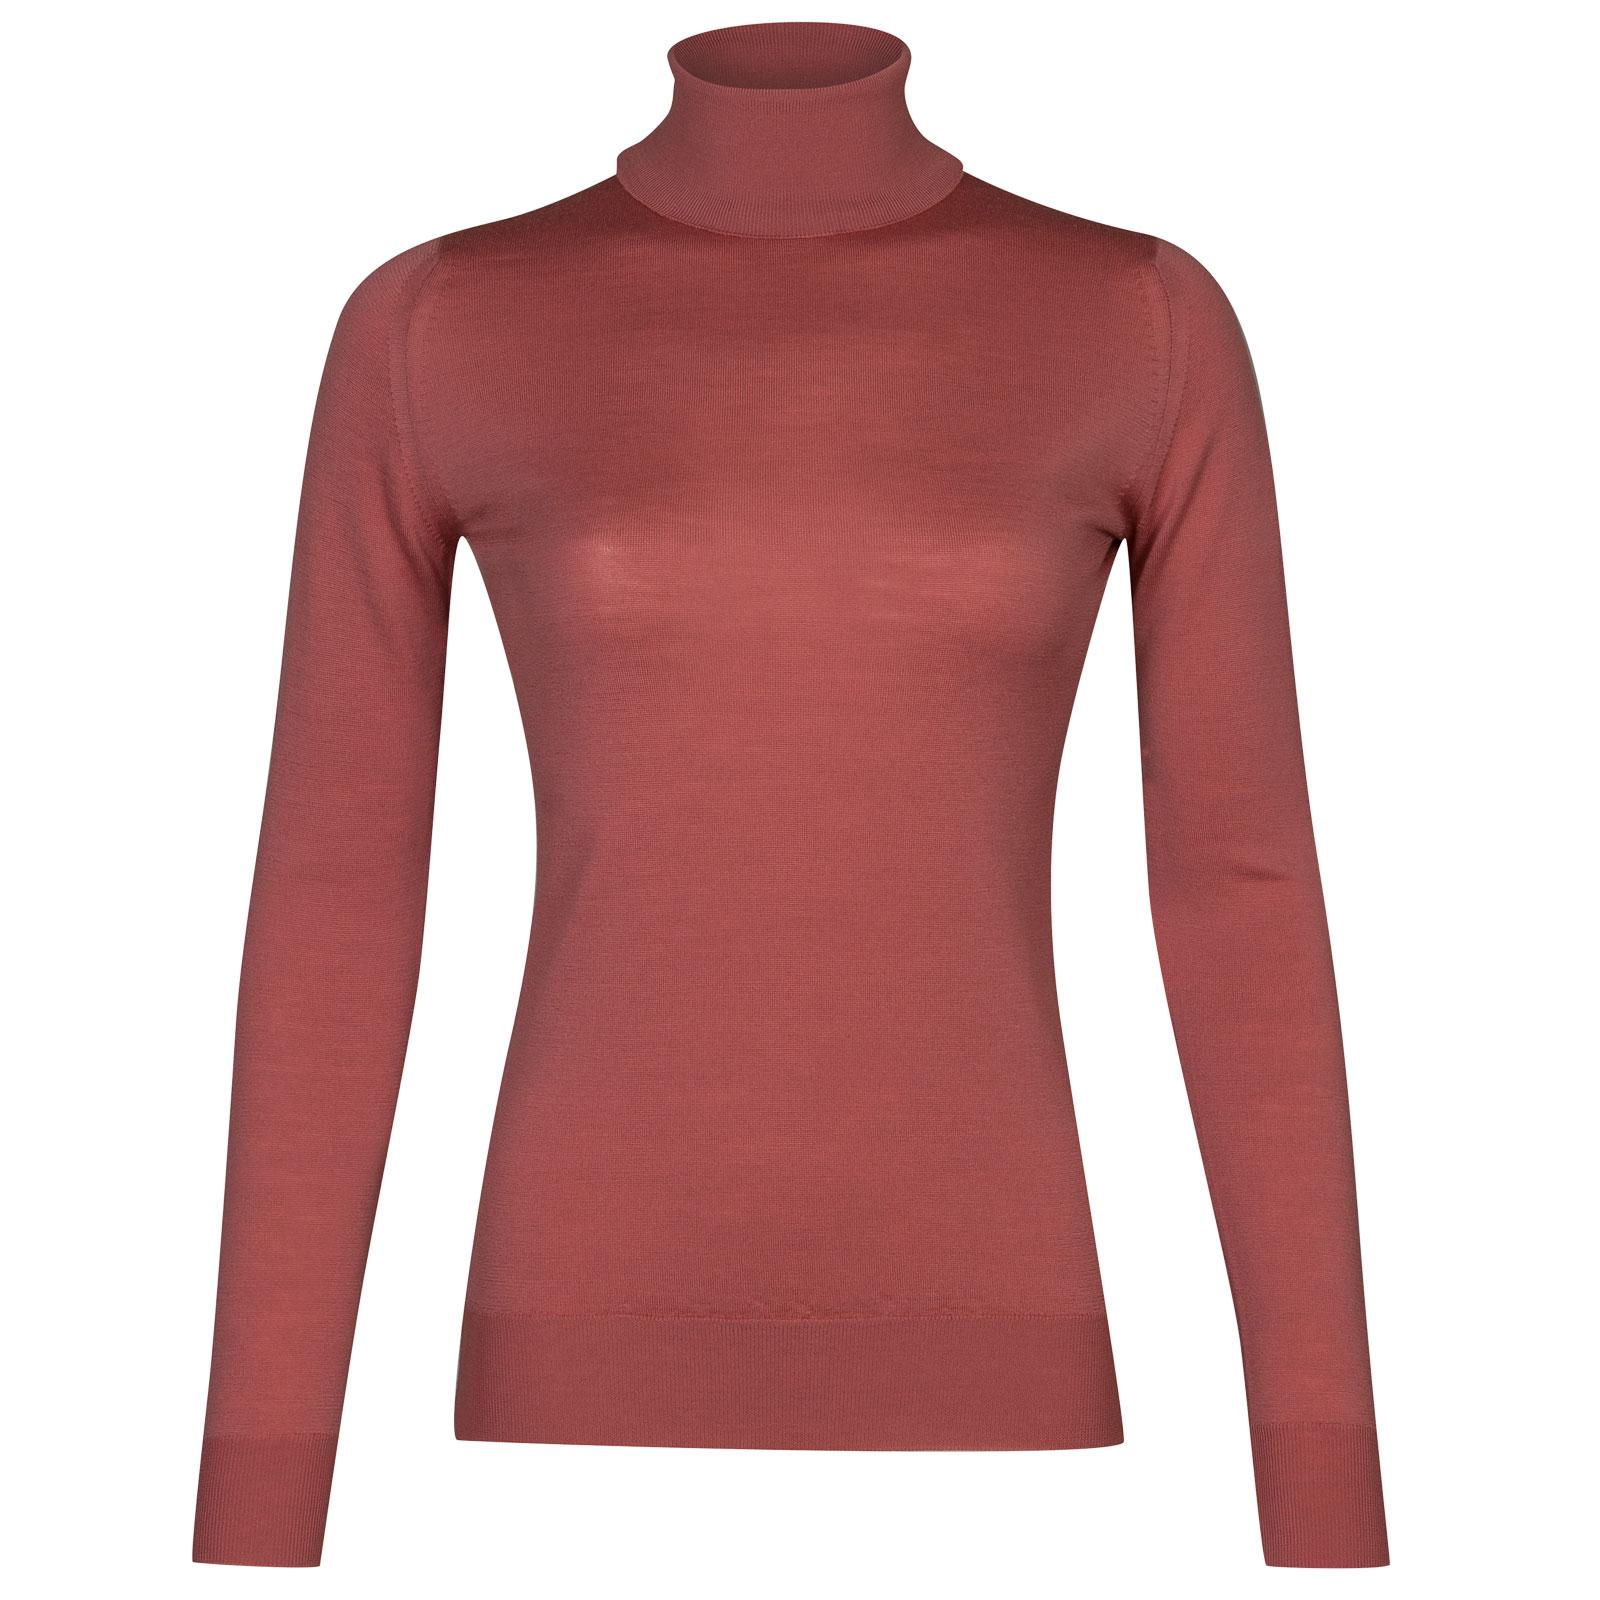 John Smedley Catkin Merino Wool Sweater in Stanton Pink-L